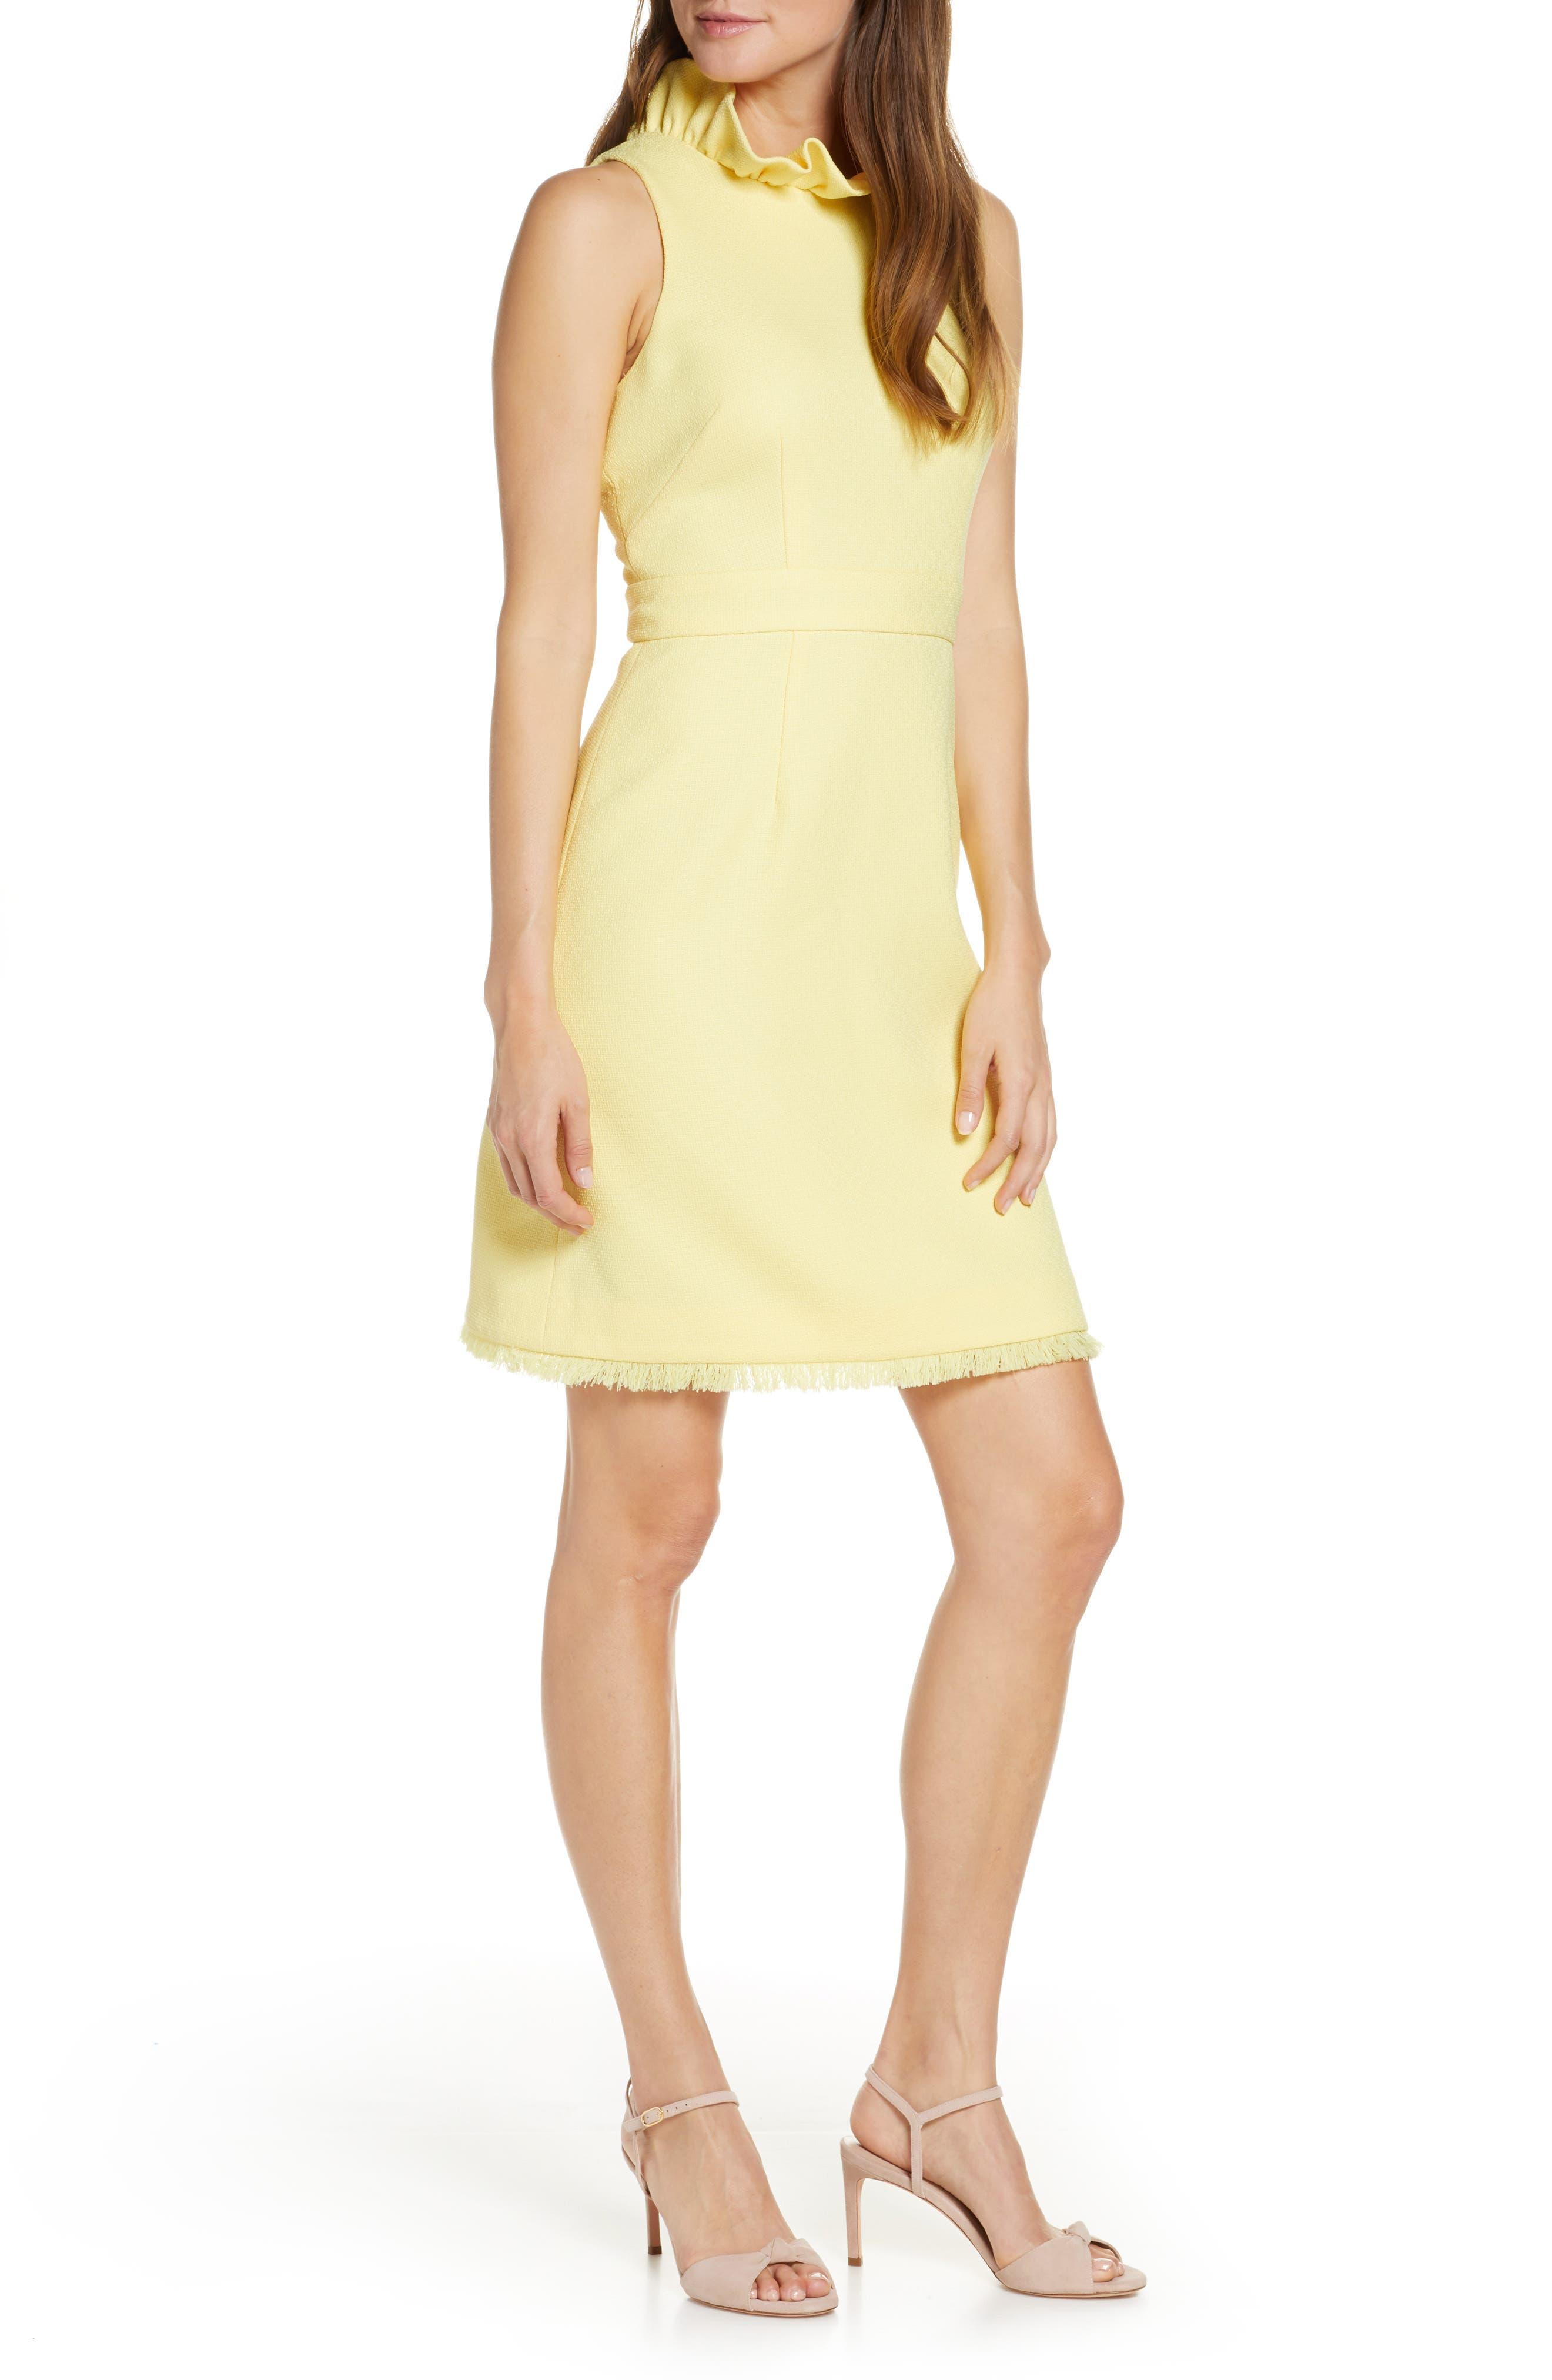 Petite Dresses For WomenNordstrom For Petite Dresses WomenNordstrom WomenNordstrom For Petite Dresses Dresses Petite mN80nw